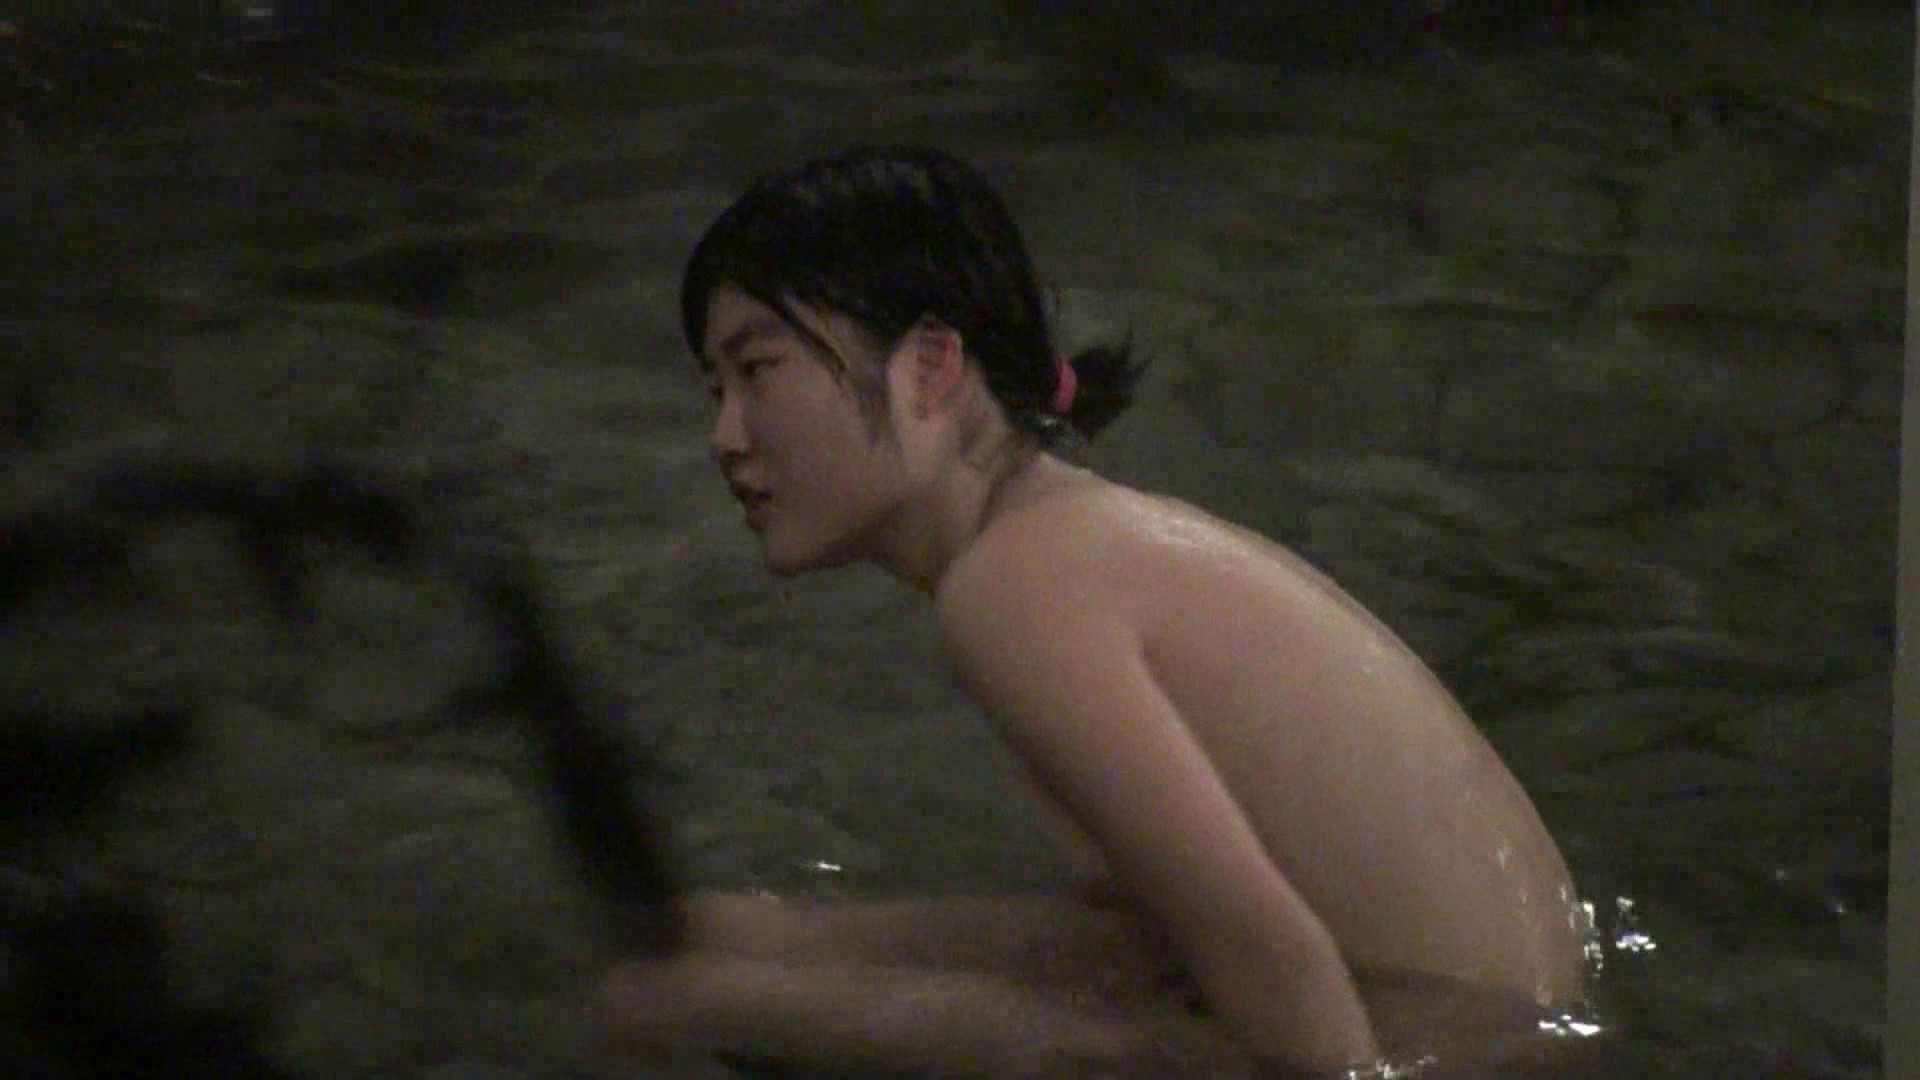 Aquaな露天風呂Vol.343 女体盗撮 盗撮ヌード画像 91連発 5